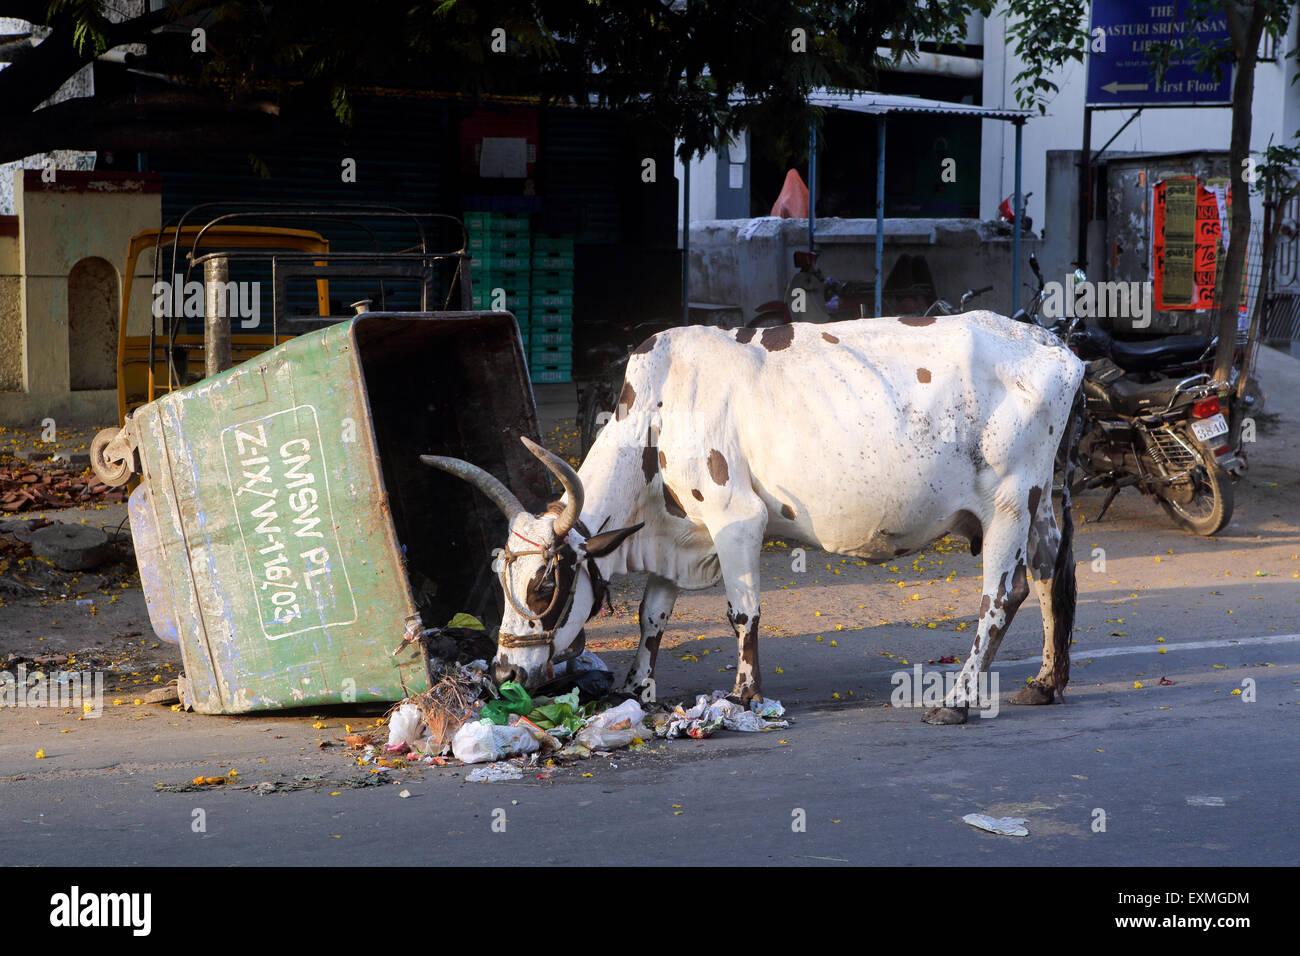 Pastoreo de vacas de basuras skip en Chennai urban street Imagen De Stock